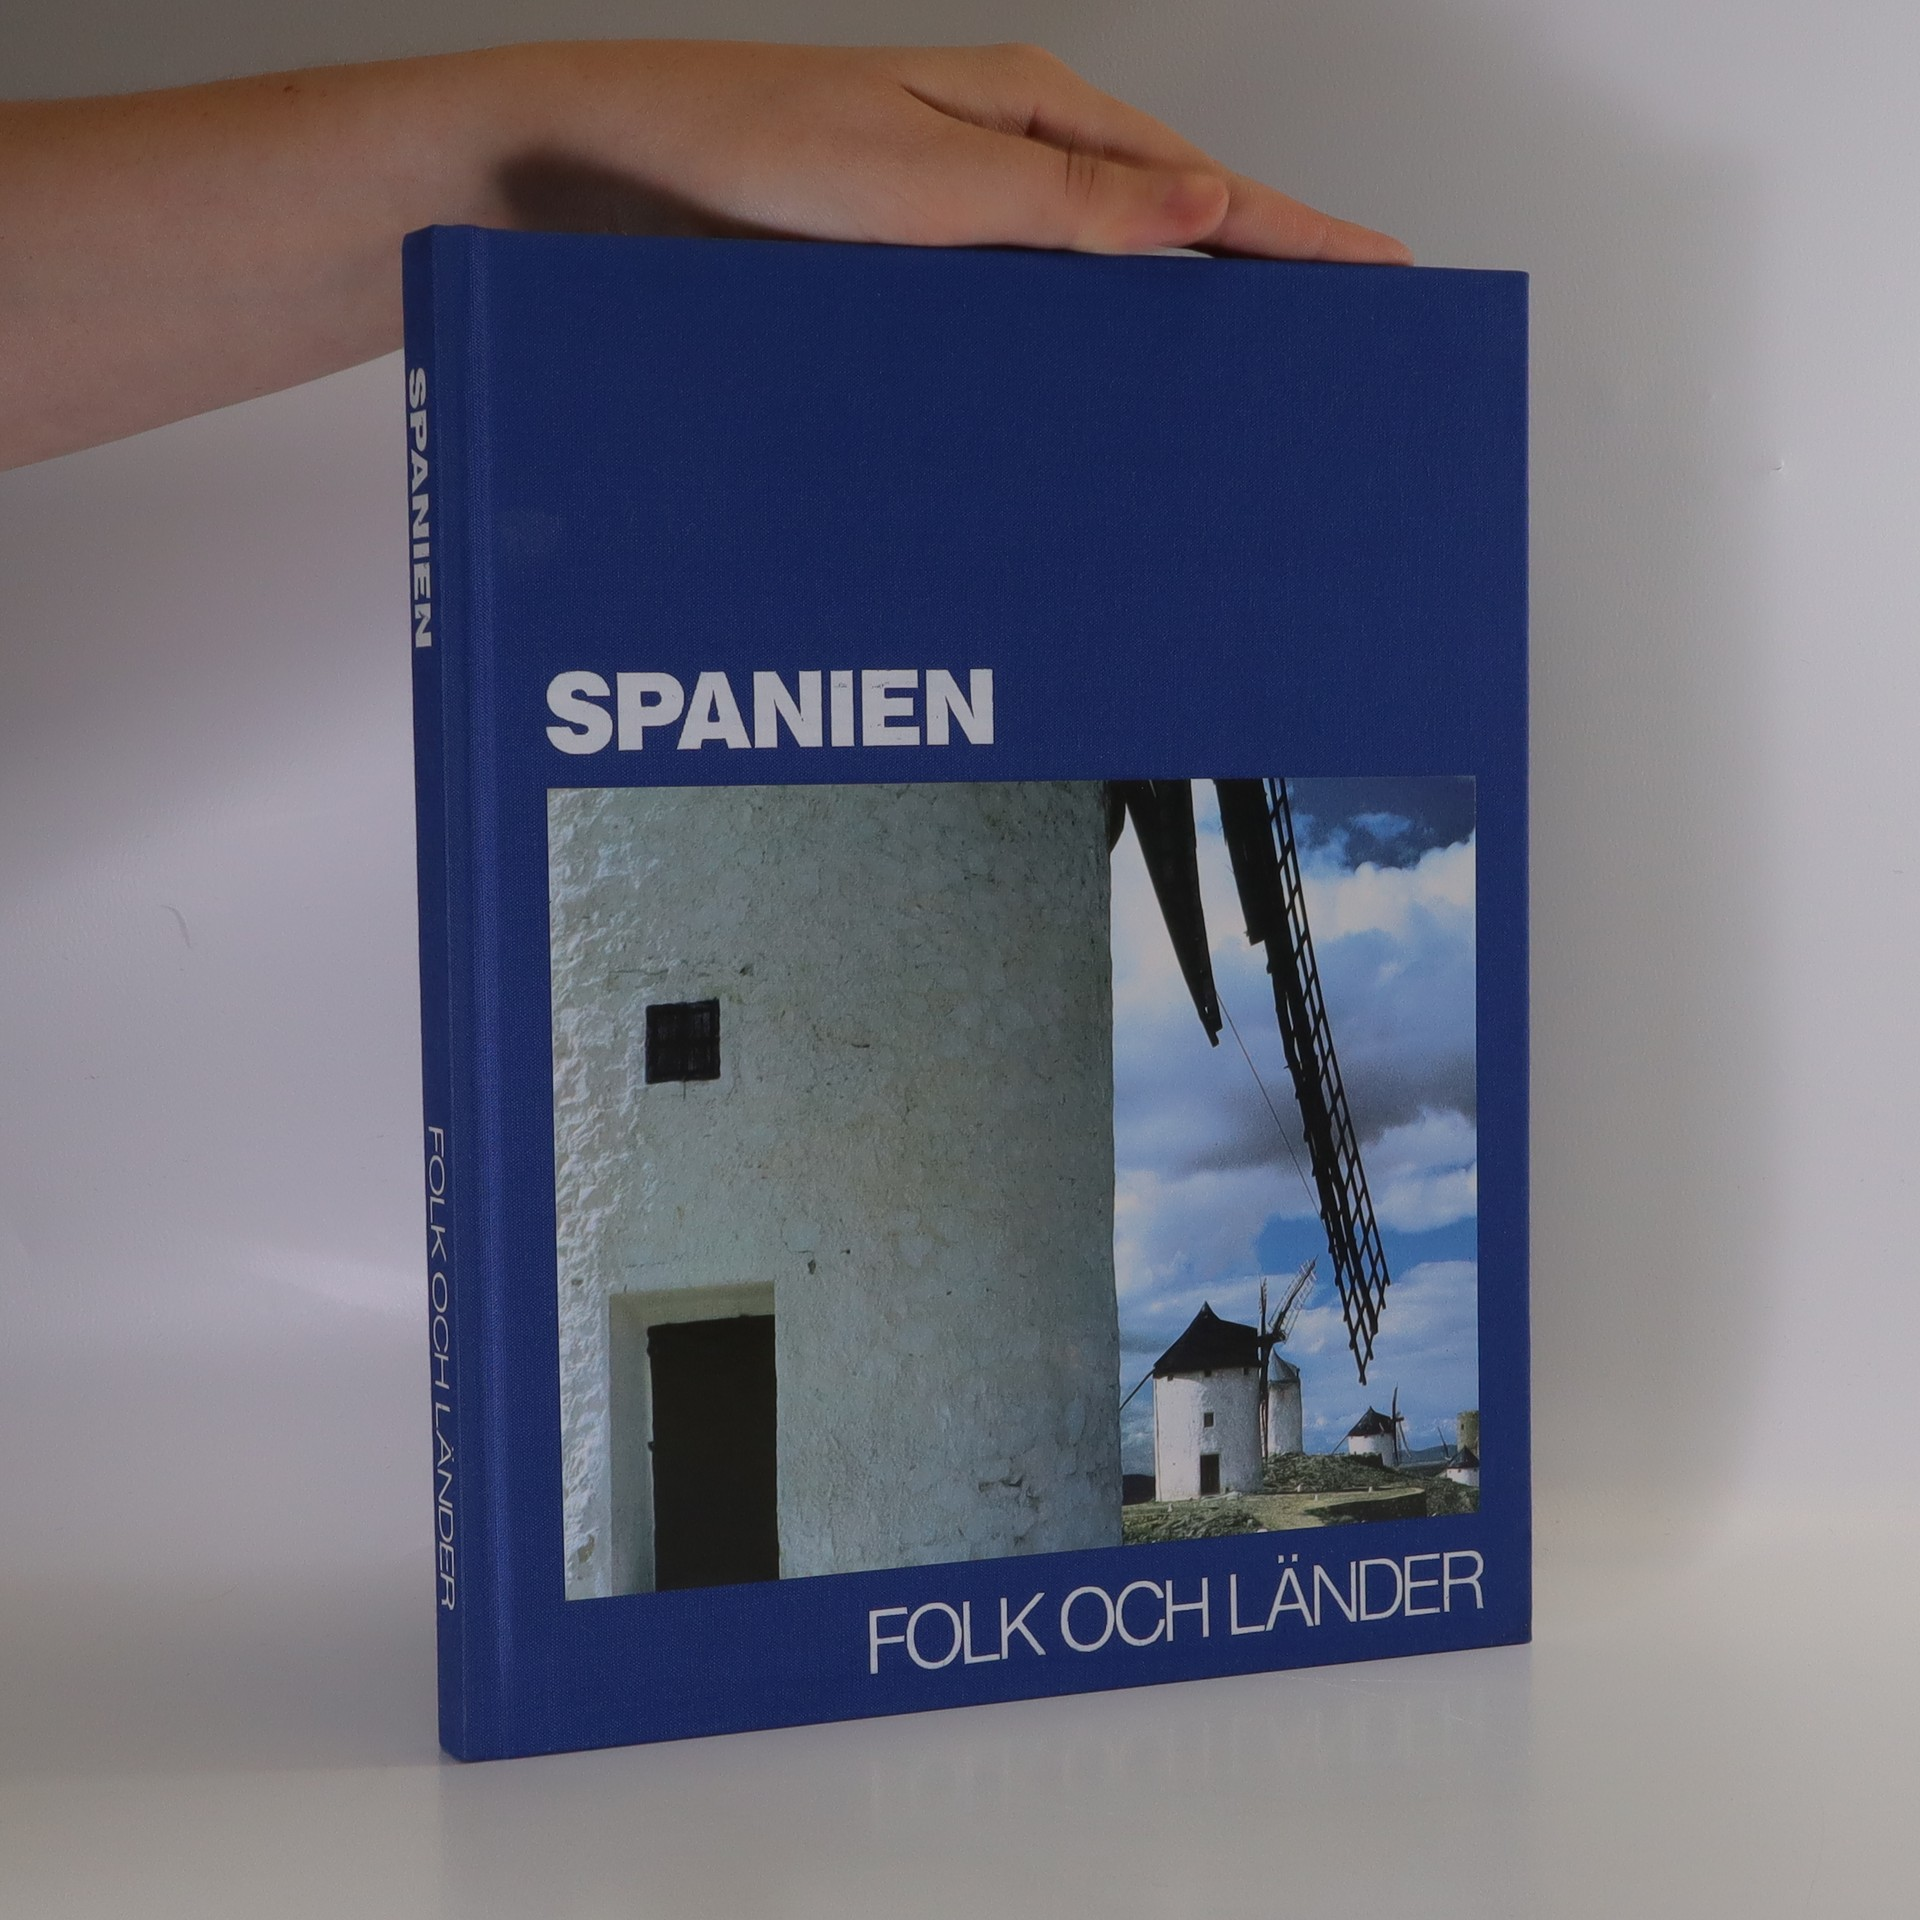 antikvární kniha Spanien, 1986